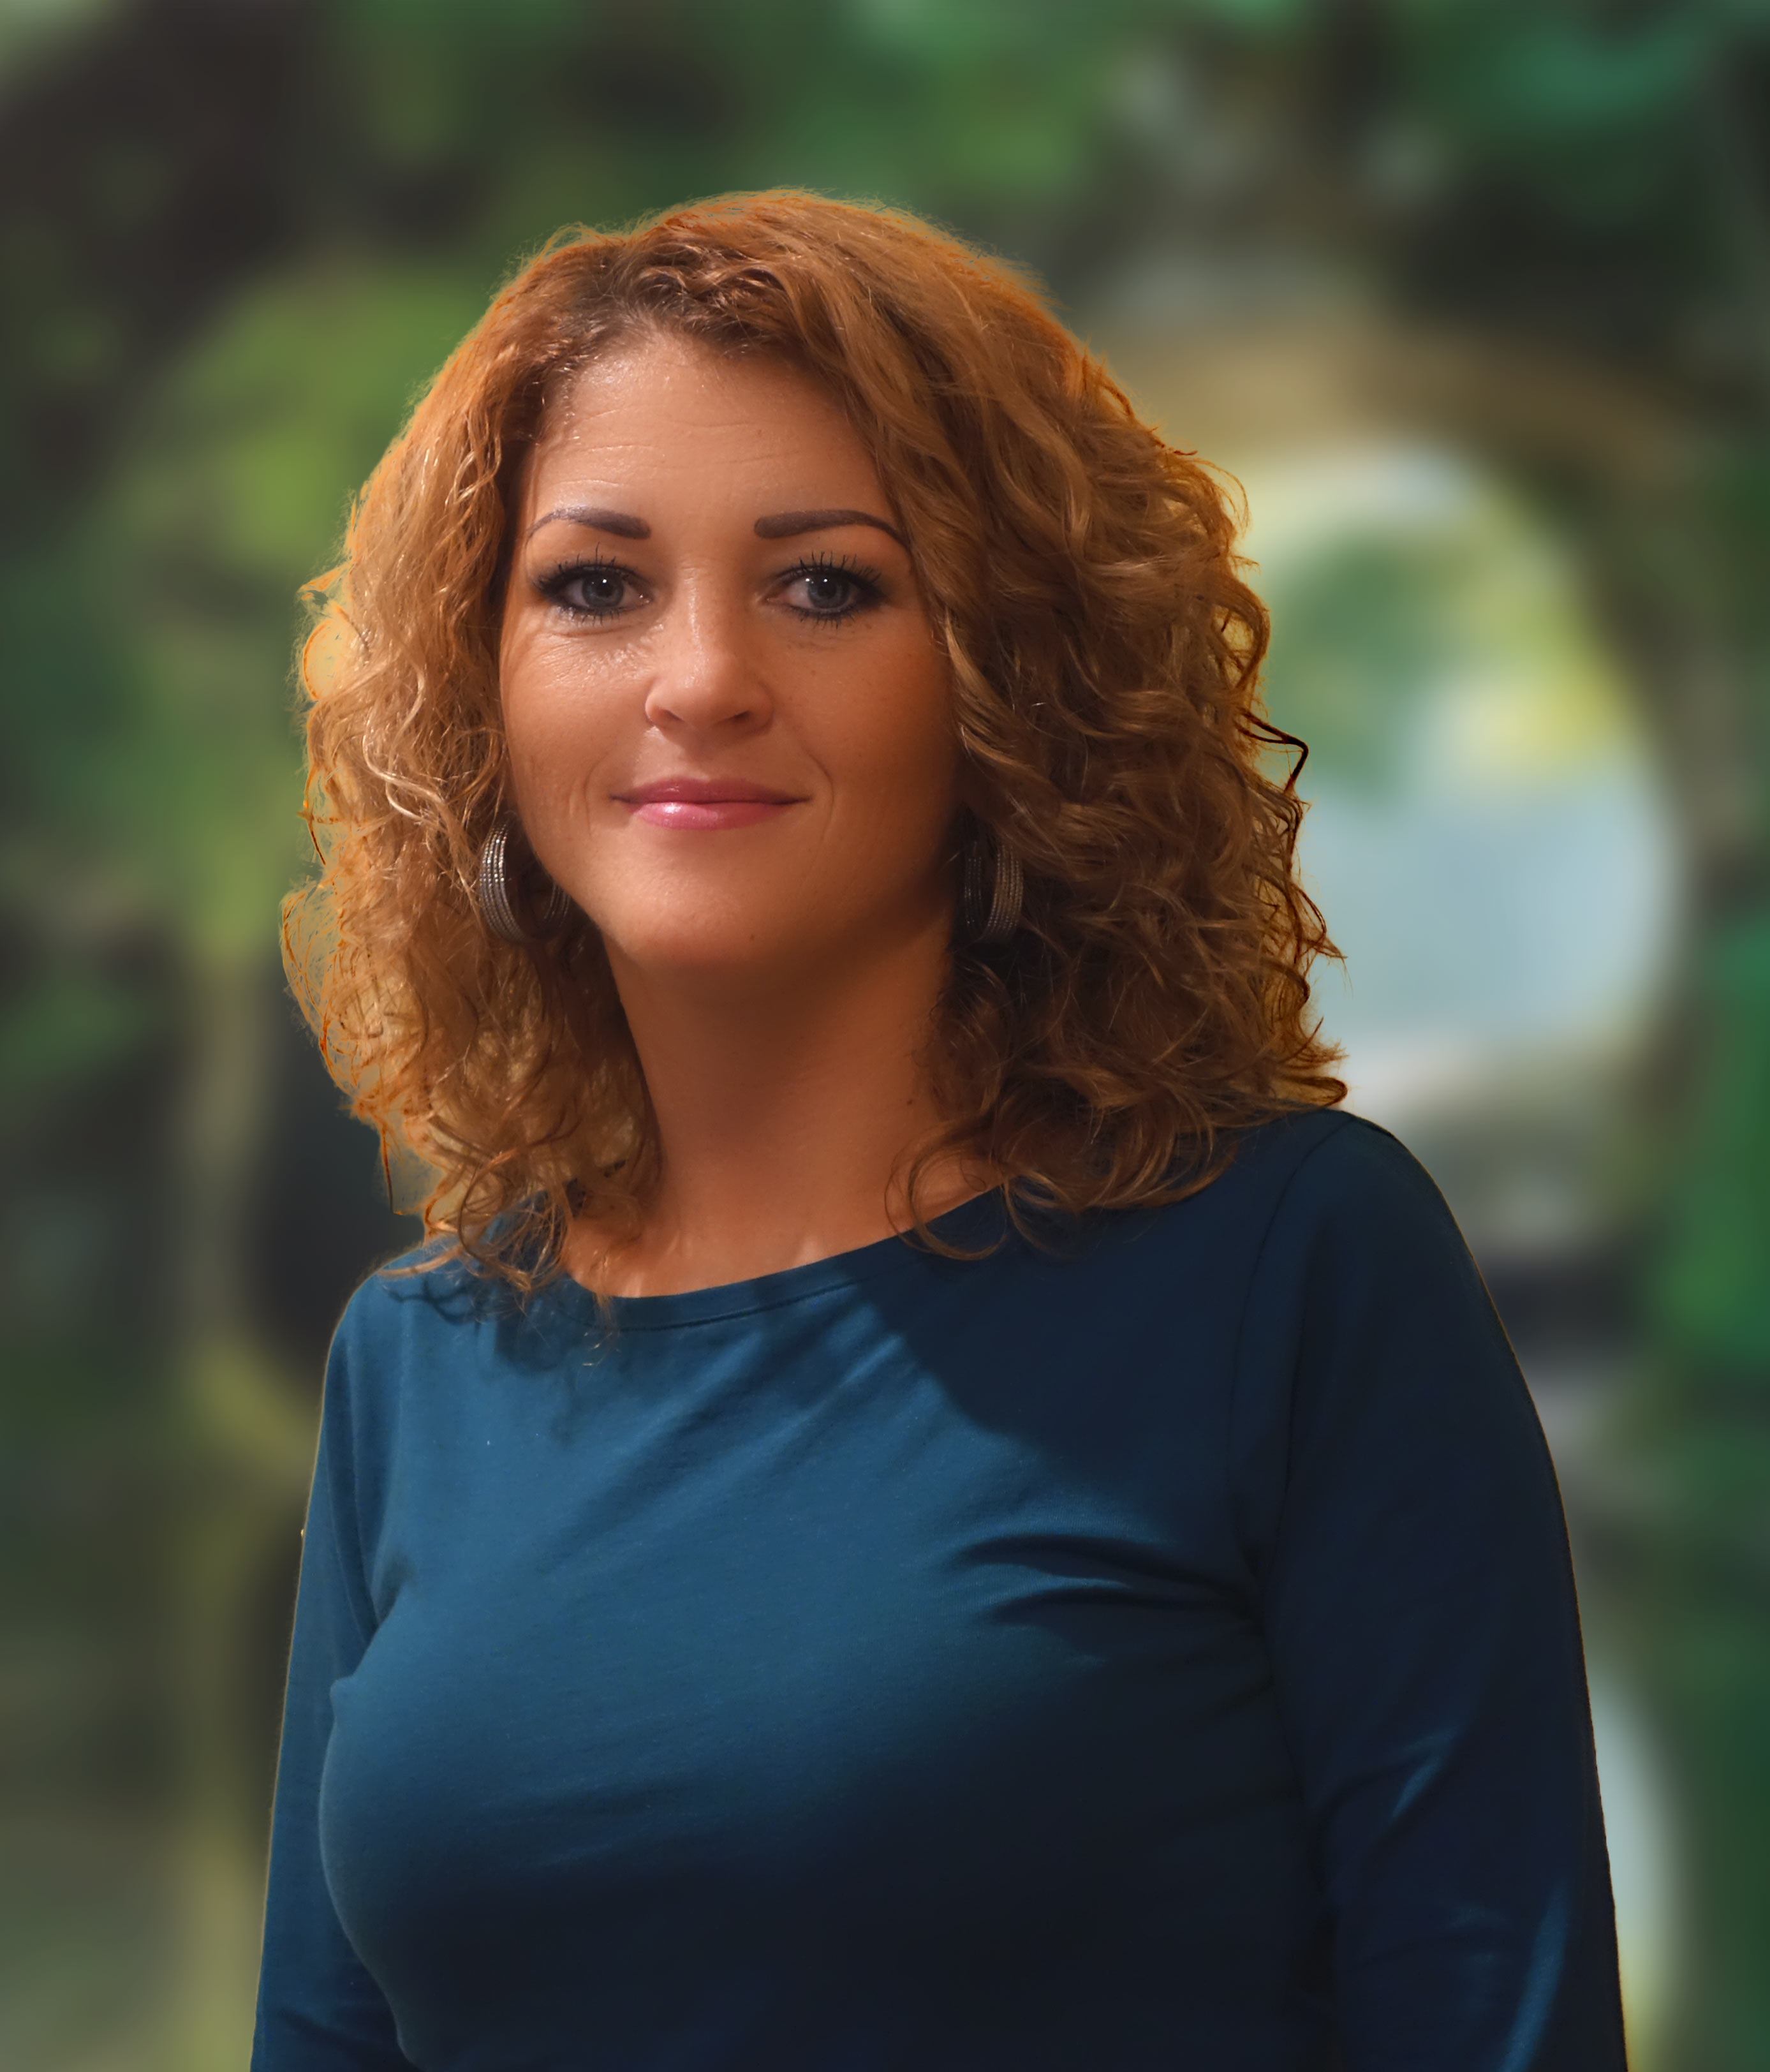 Agnieszka Fortuna